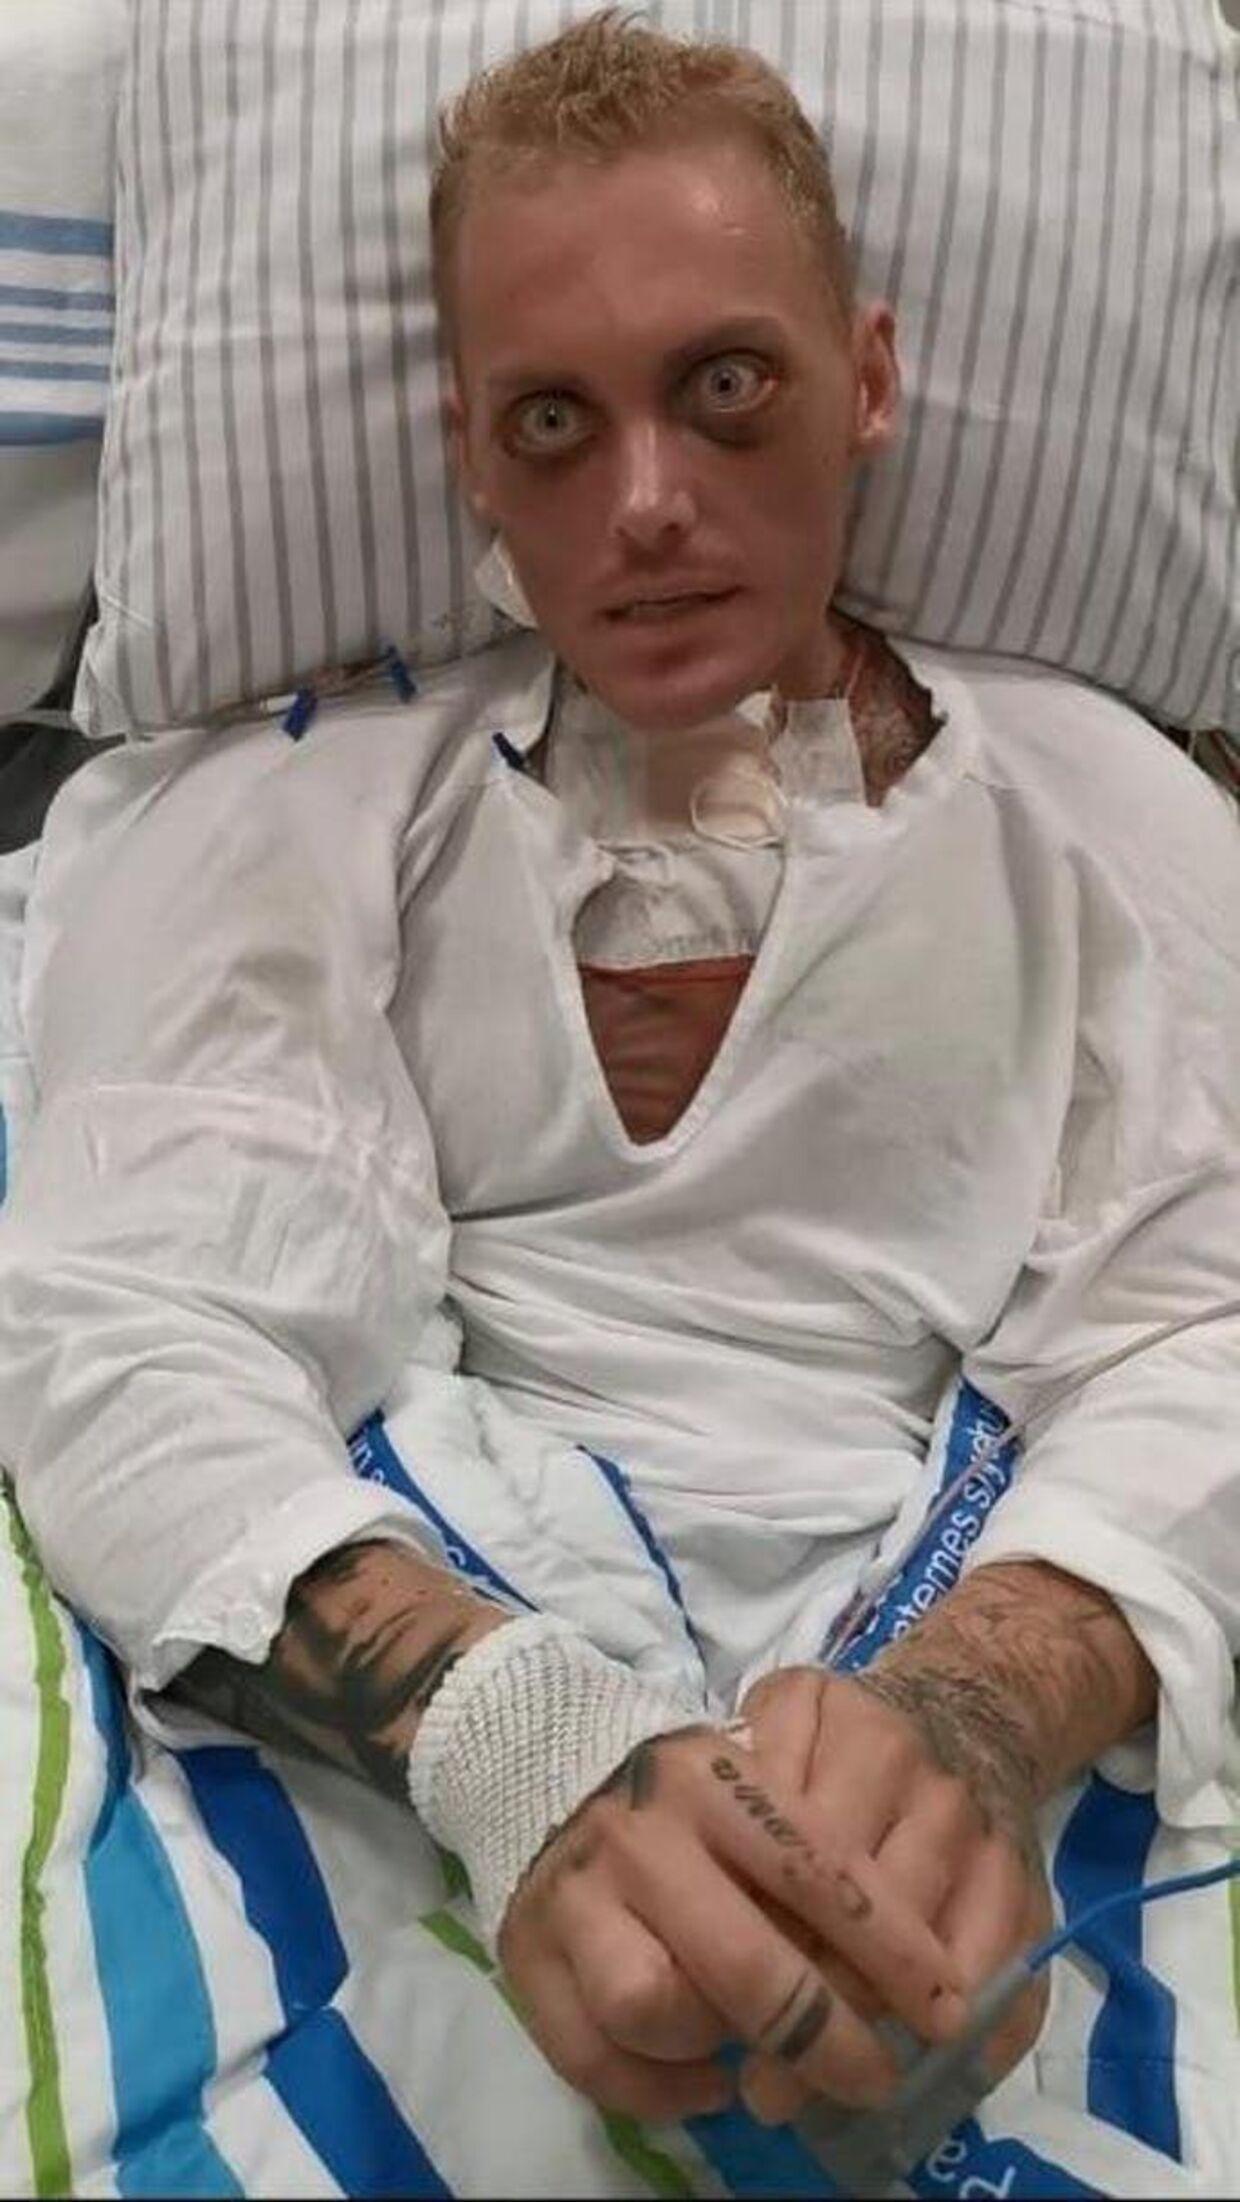 Patrick Teichert på hospitalet. Privatfoto.